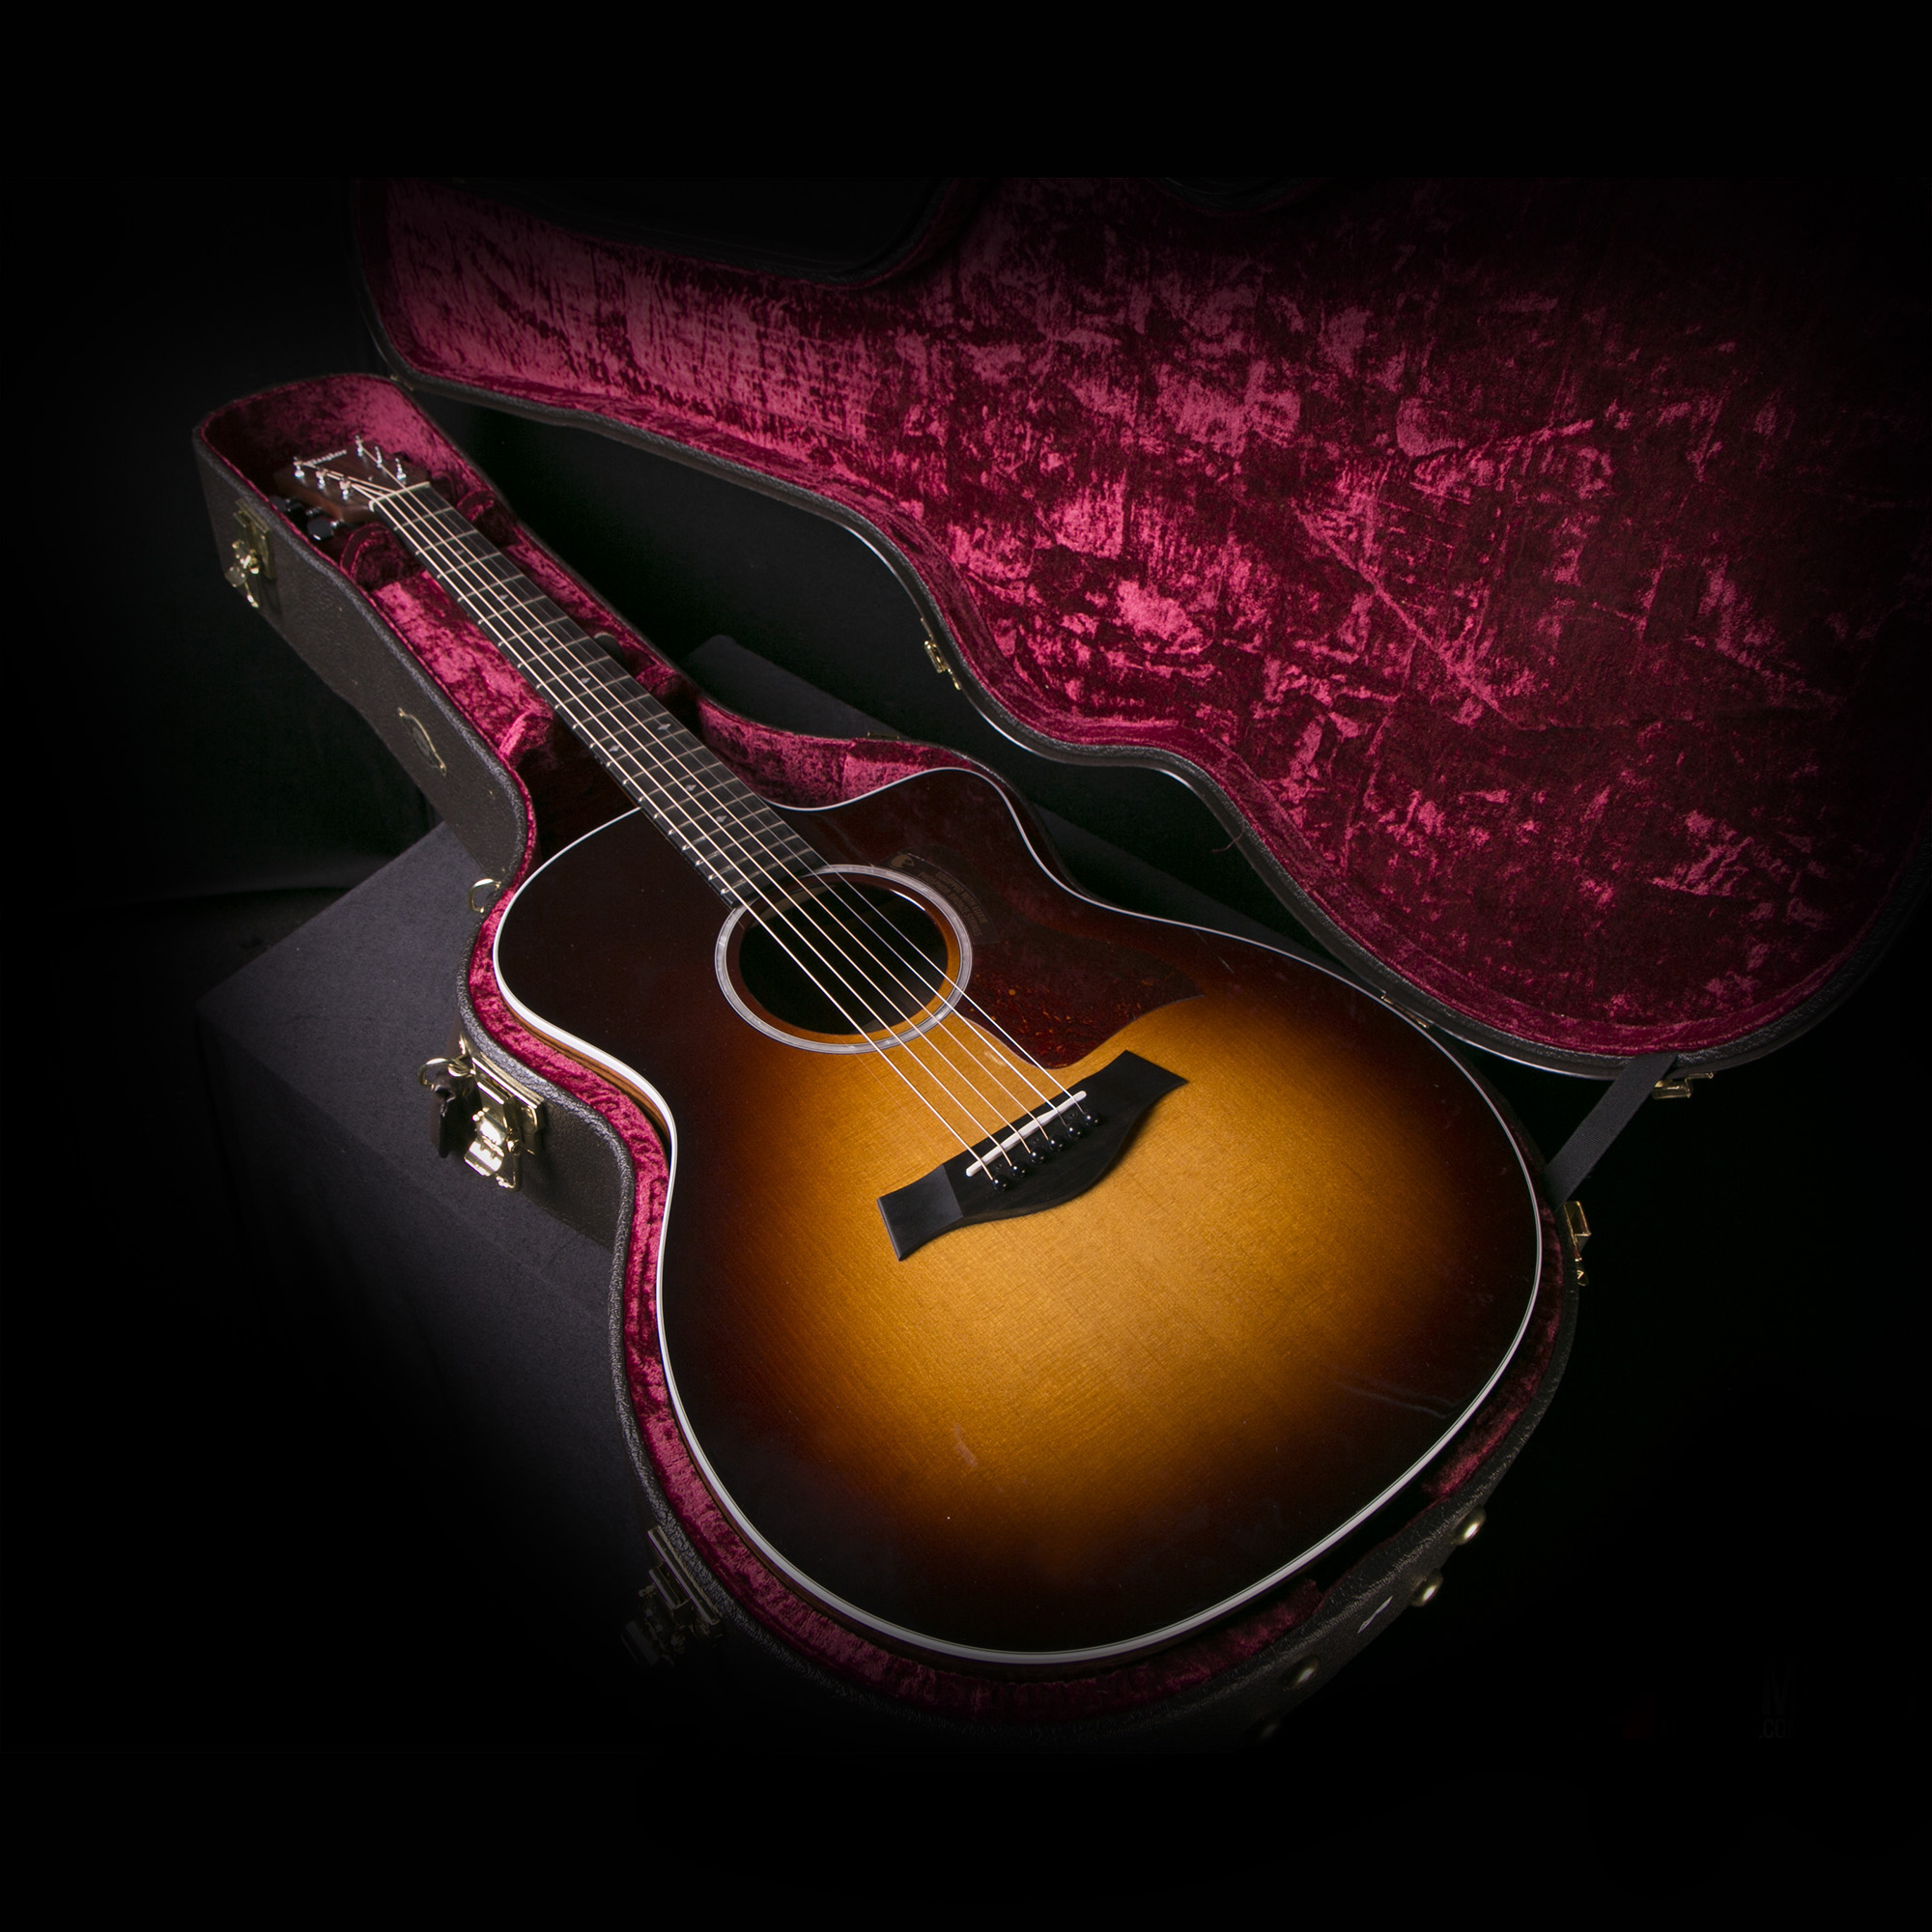 taylor 214ce dlx grand auditorium sunburst acoustic electric guitar ebay. Black Bedroom Furniture Sets. Home Design Ideas